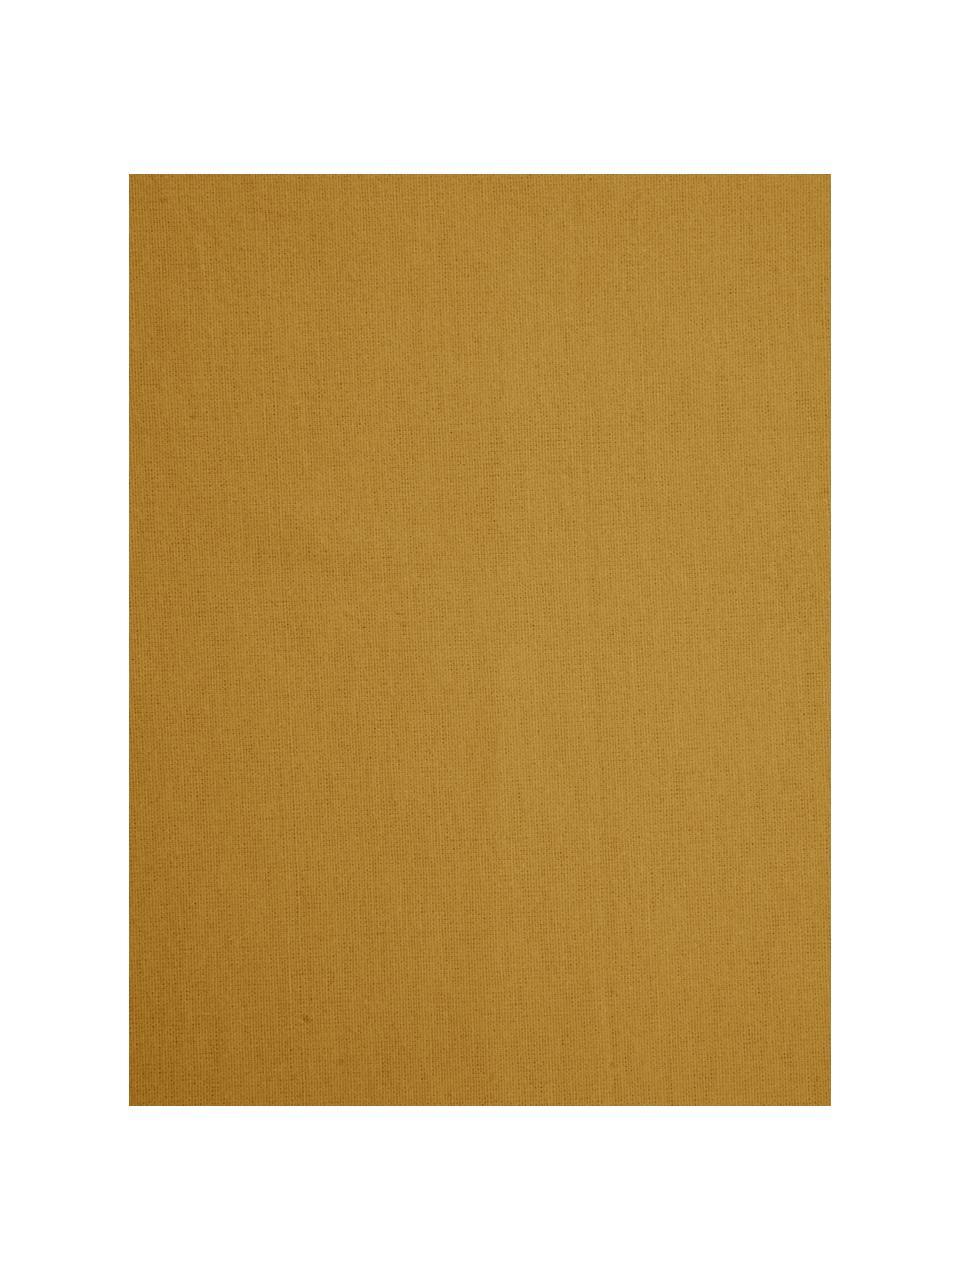 Flanell-Spannbettlaken Biba in Senfgelb, Webart: Flanell, Gelb, 90 x 200 cm